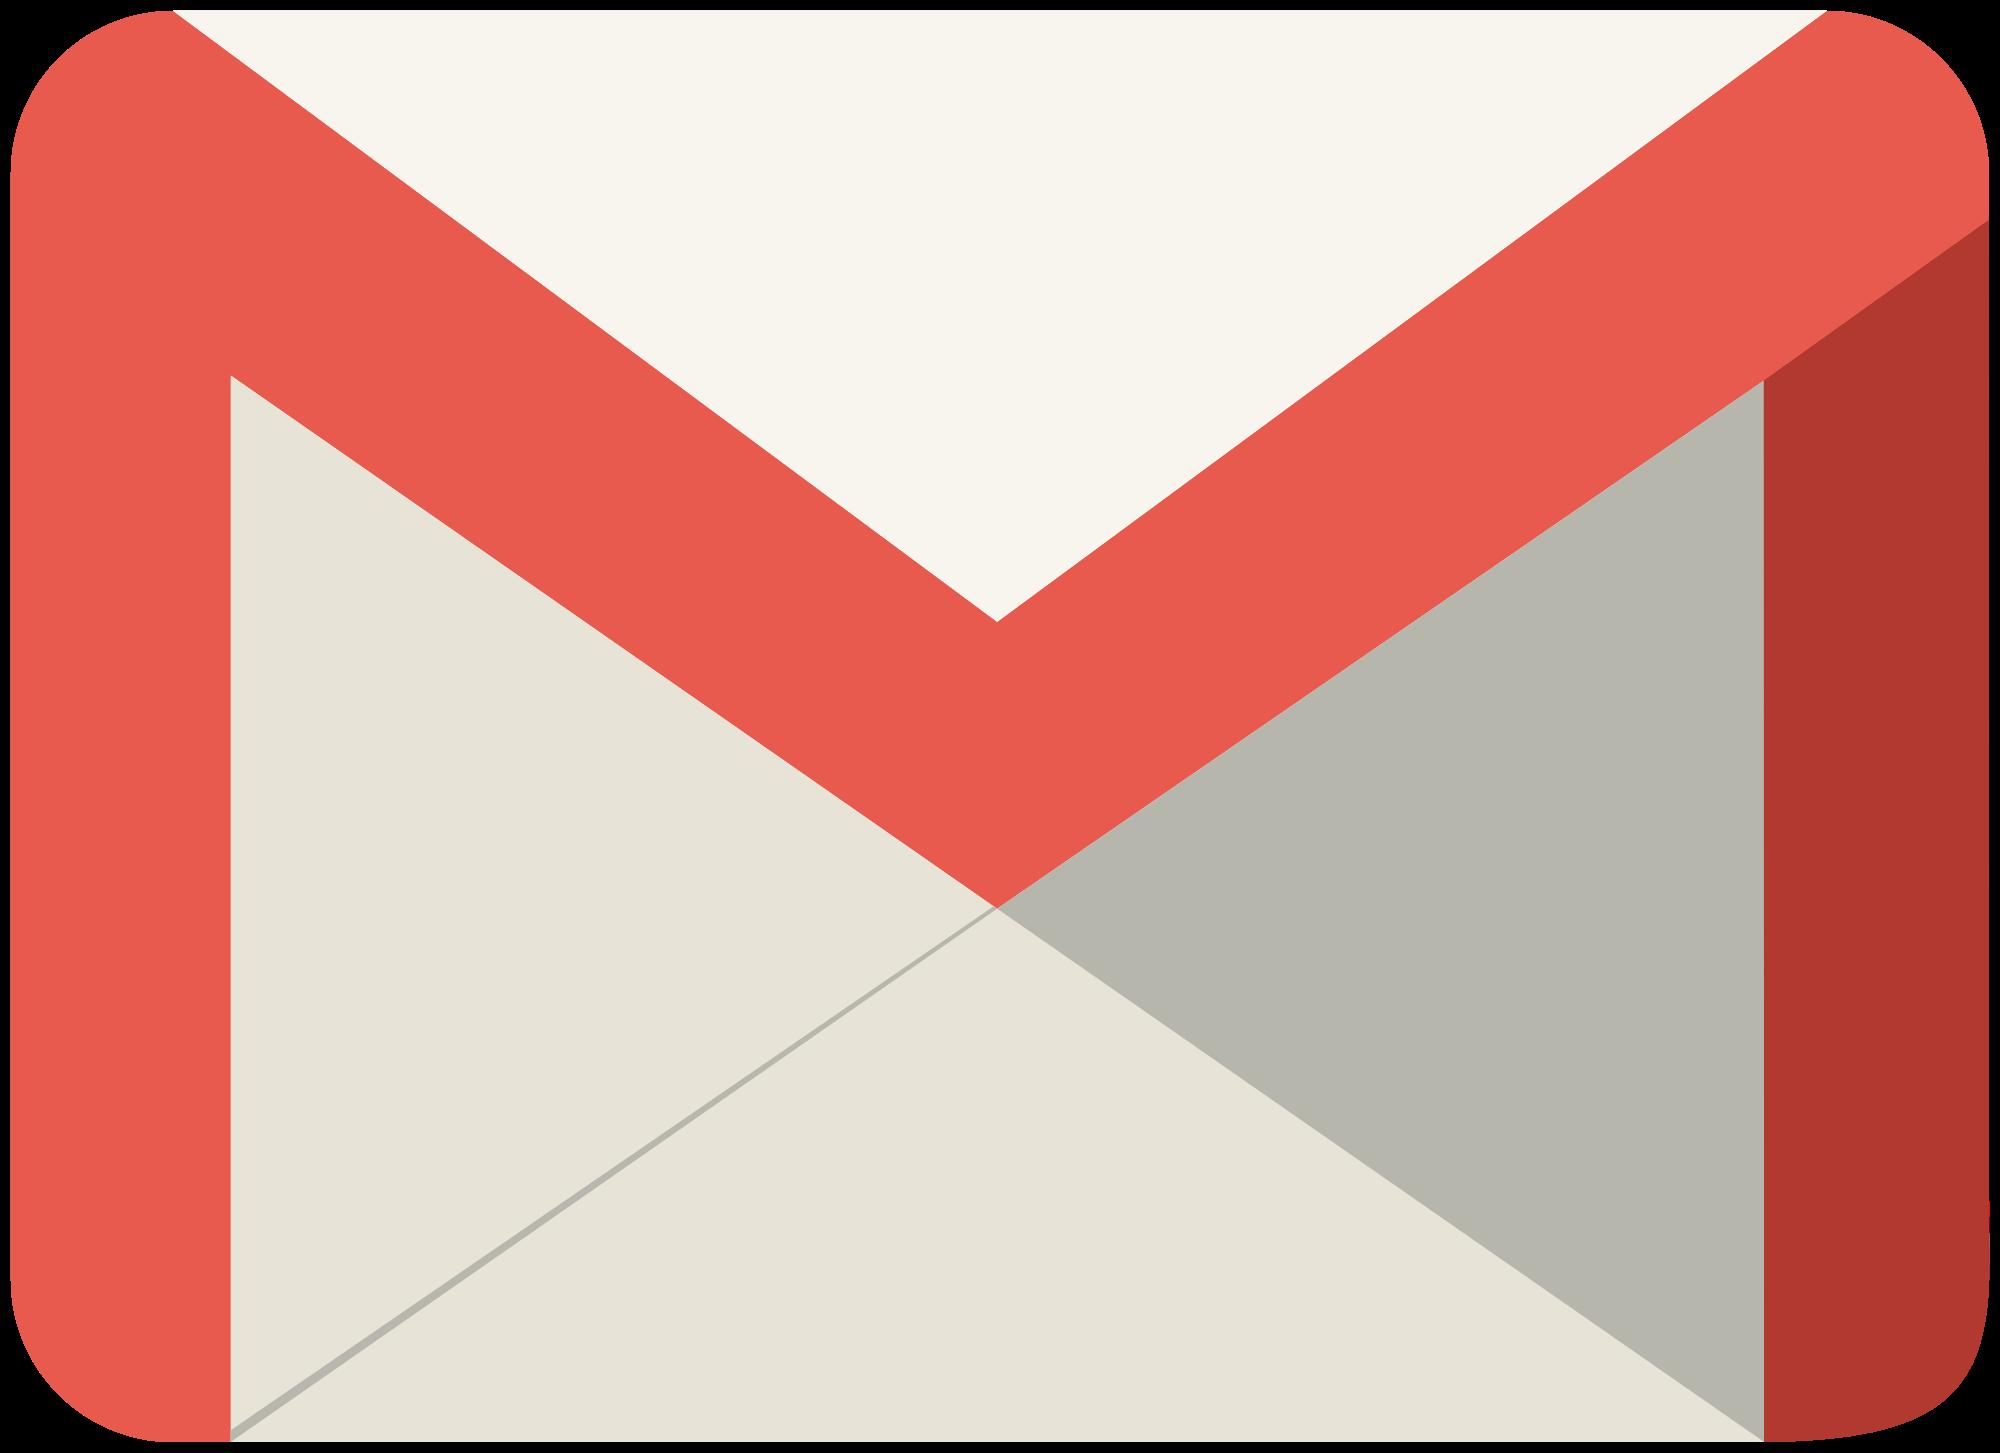 Google Mail Logo - Google Mail, Transparent background PNG HD thumbnail